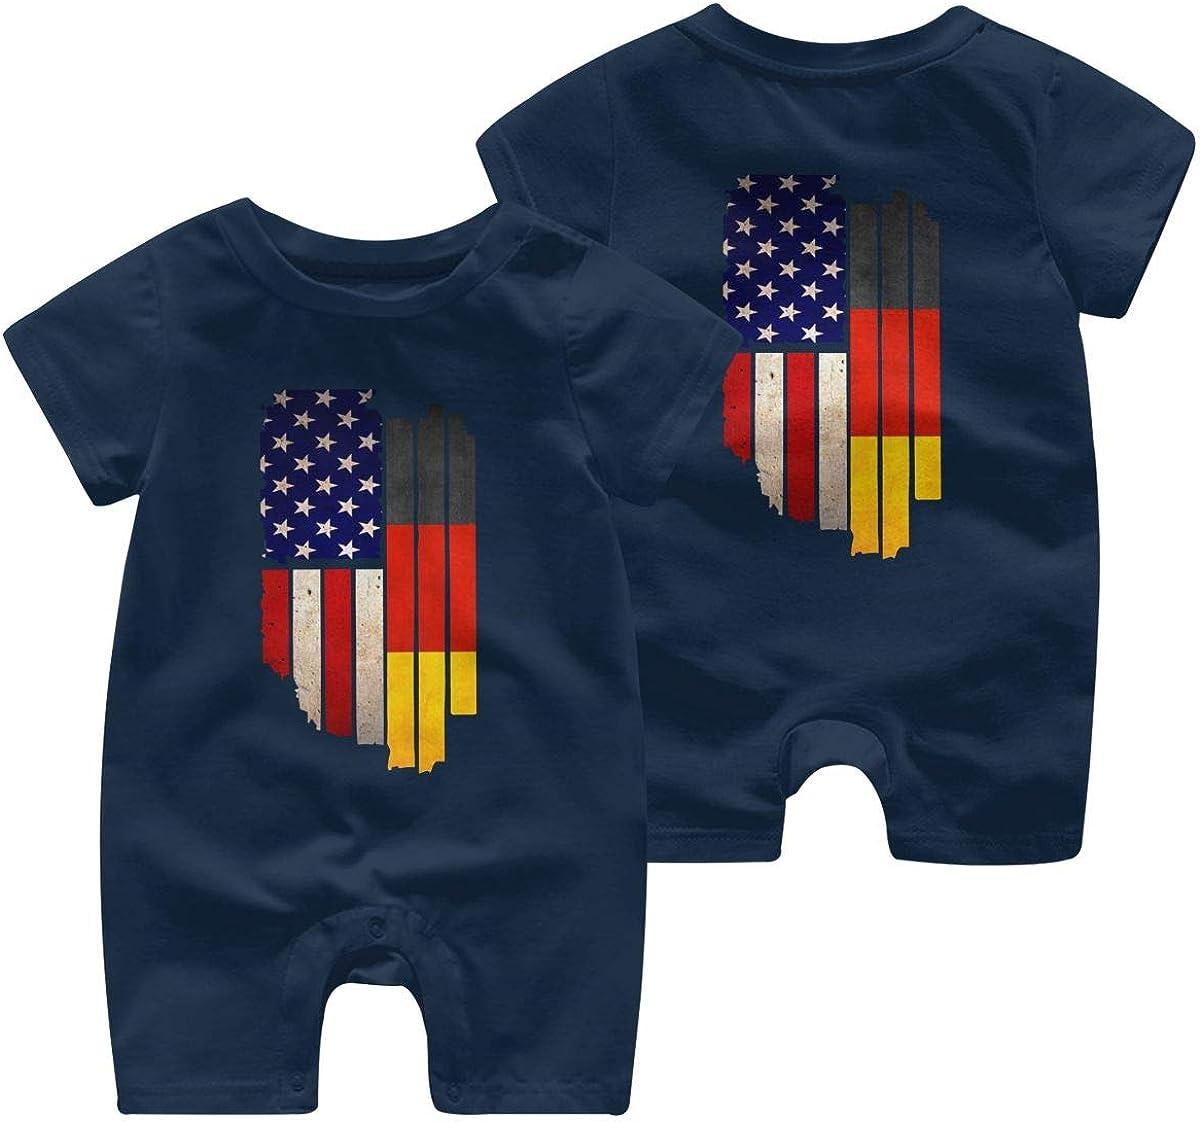 Newborn Baby Bodysuits Vintage USA Germany Flag Toddler Jumpsuit